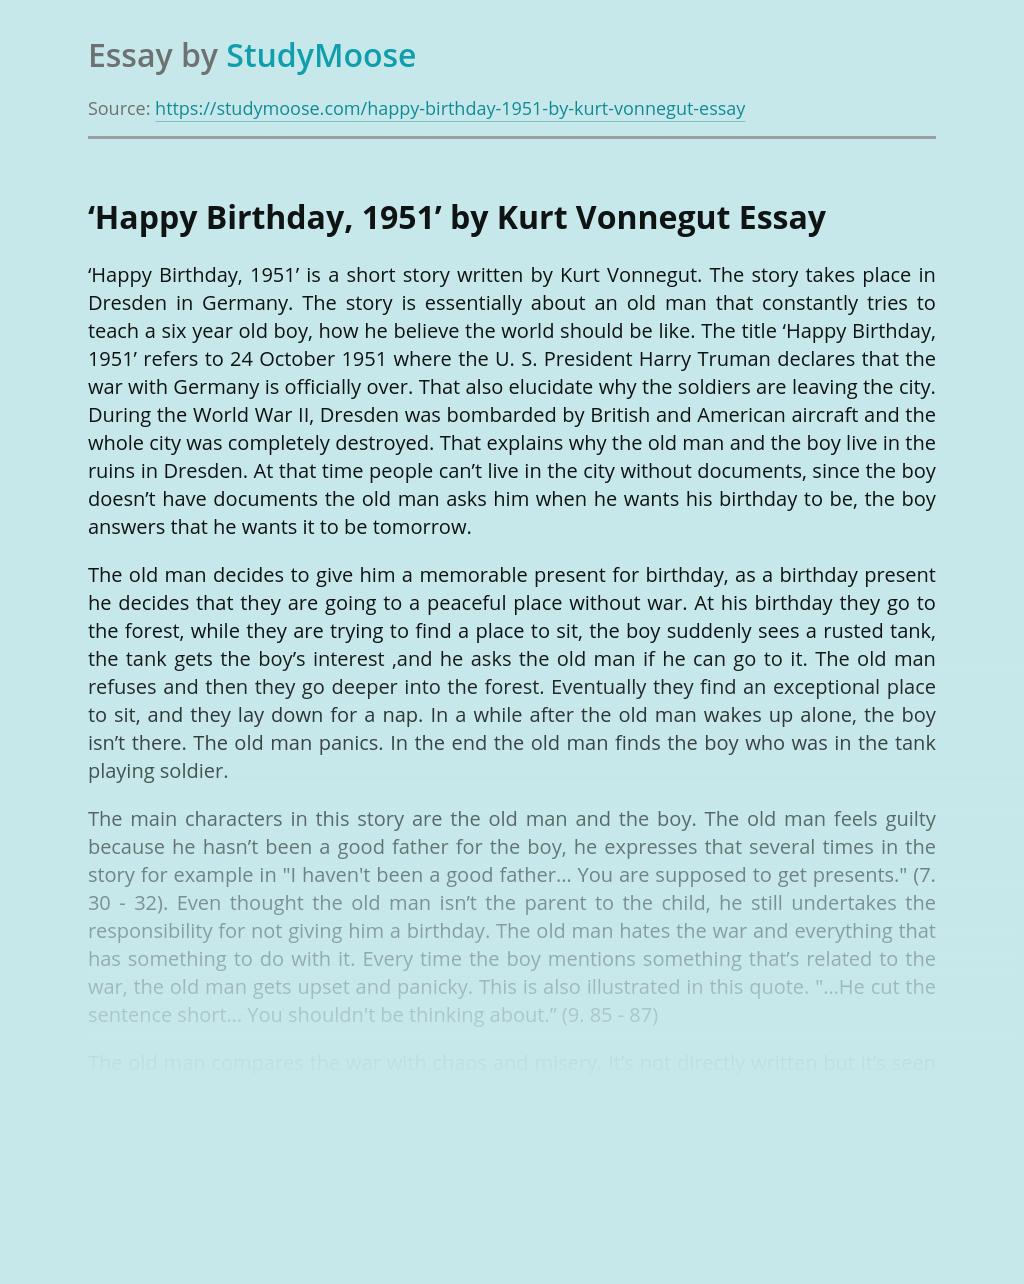 'Happy Birthday, 1951' by Kurt Vonnegut